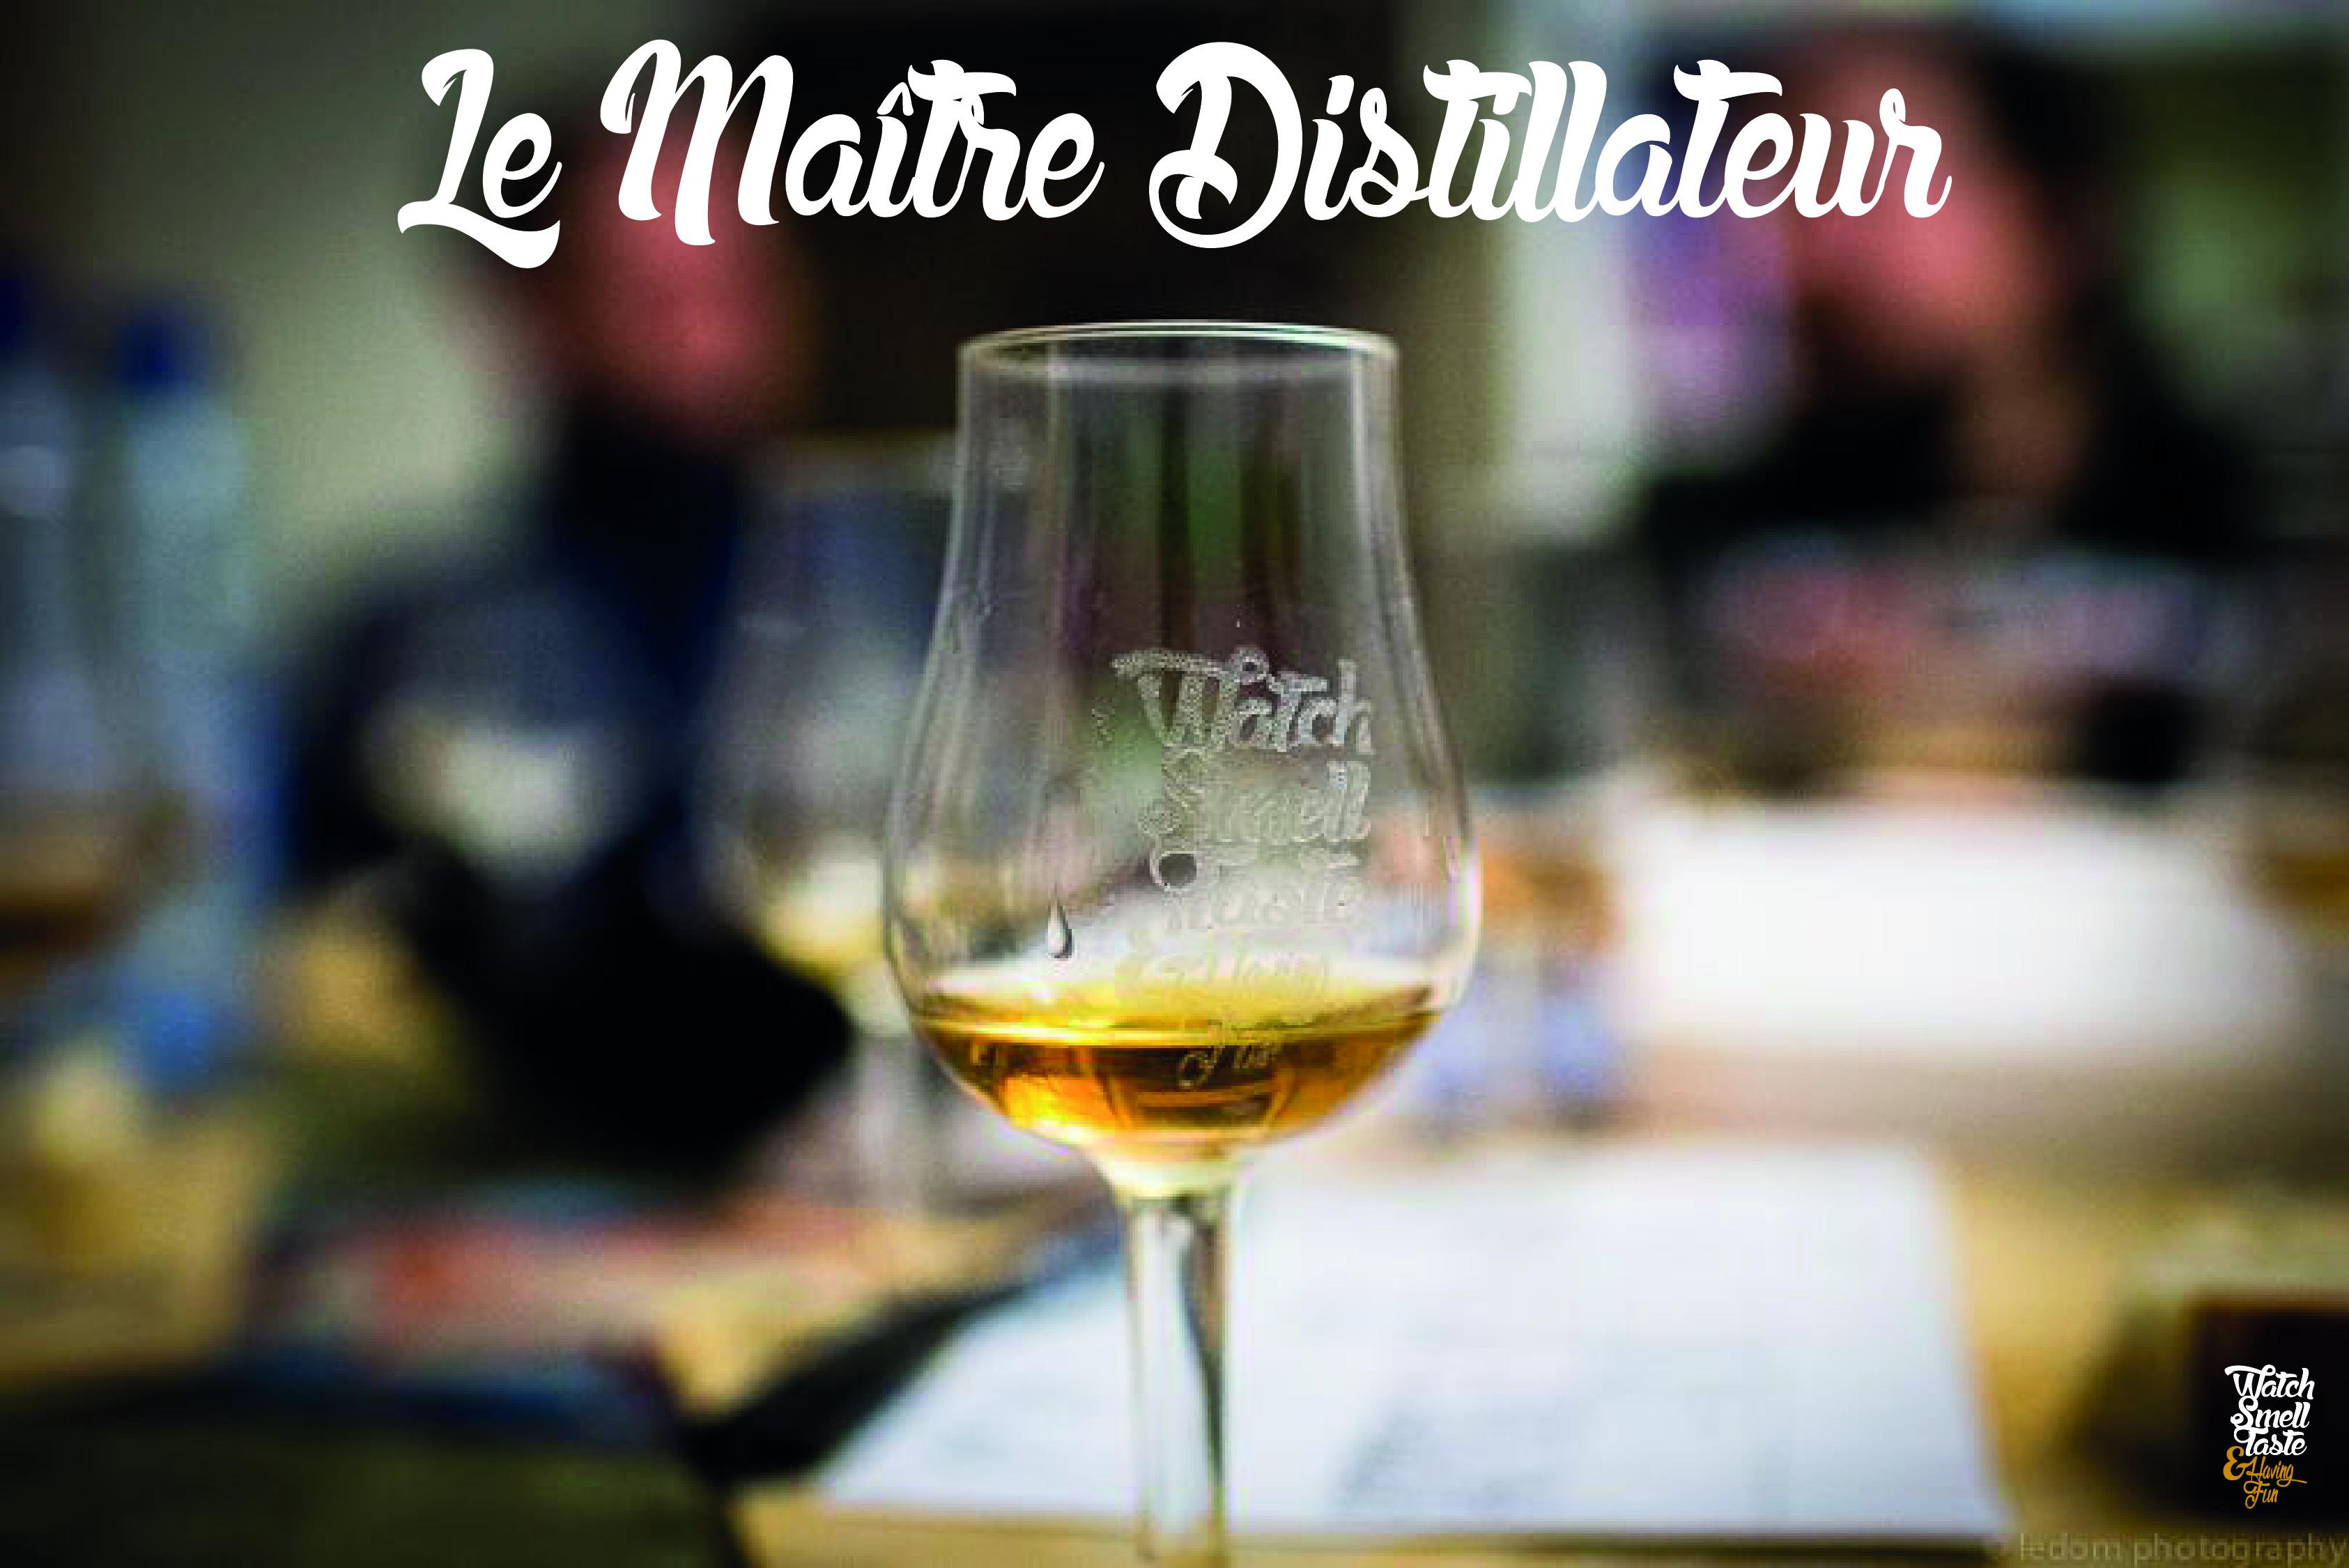 Le_Ma_tre_Distillateur-1453026312.jpg